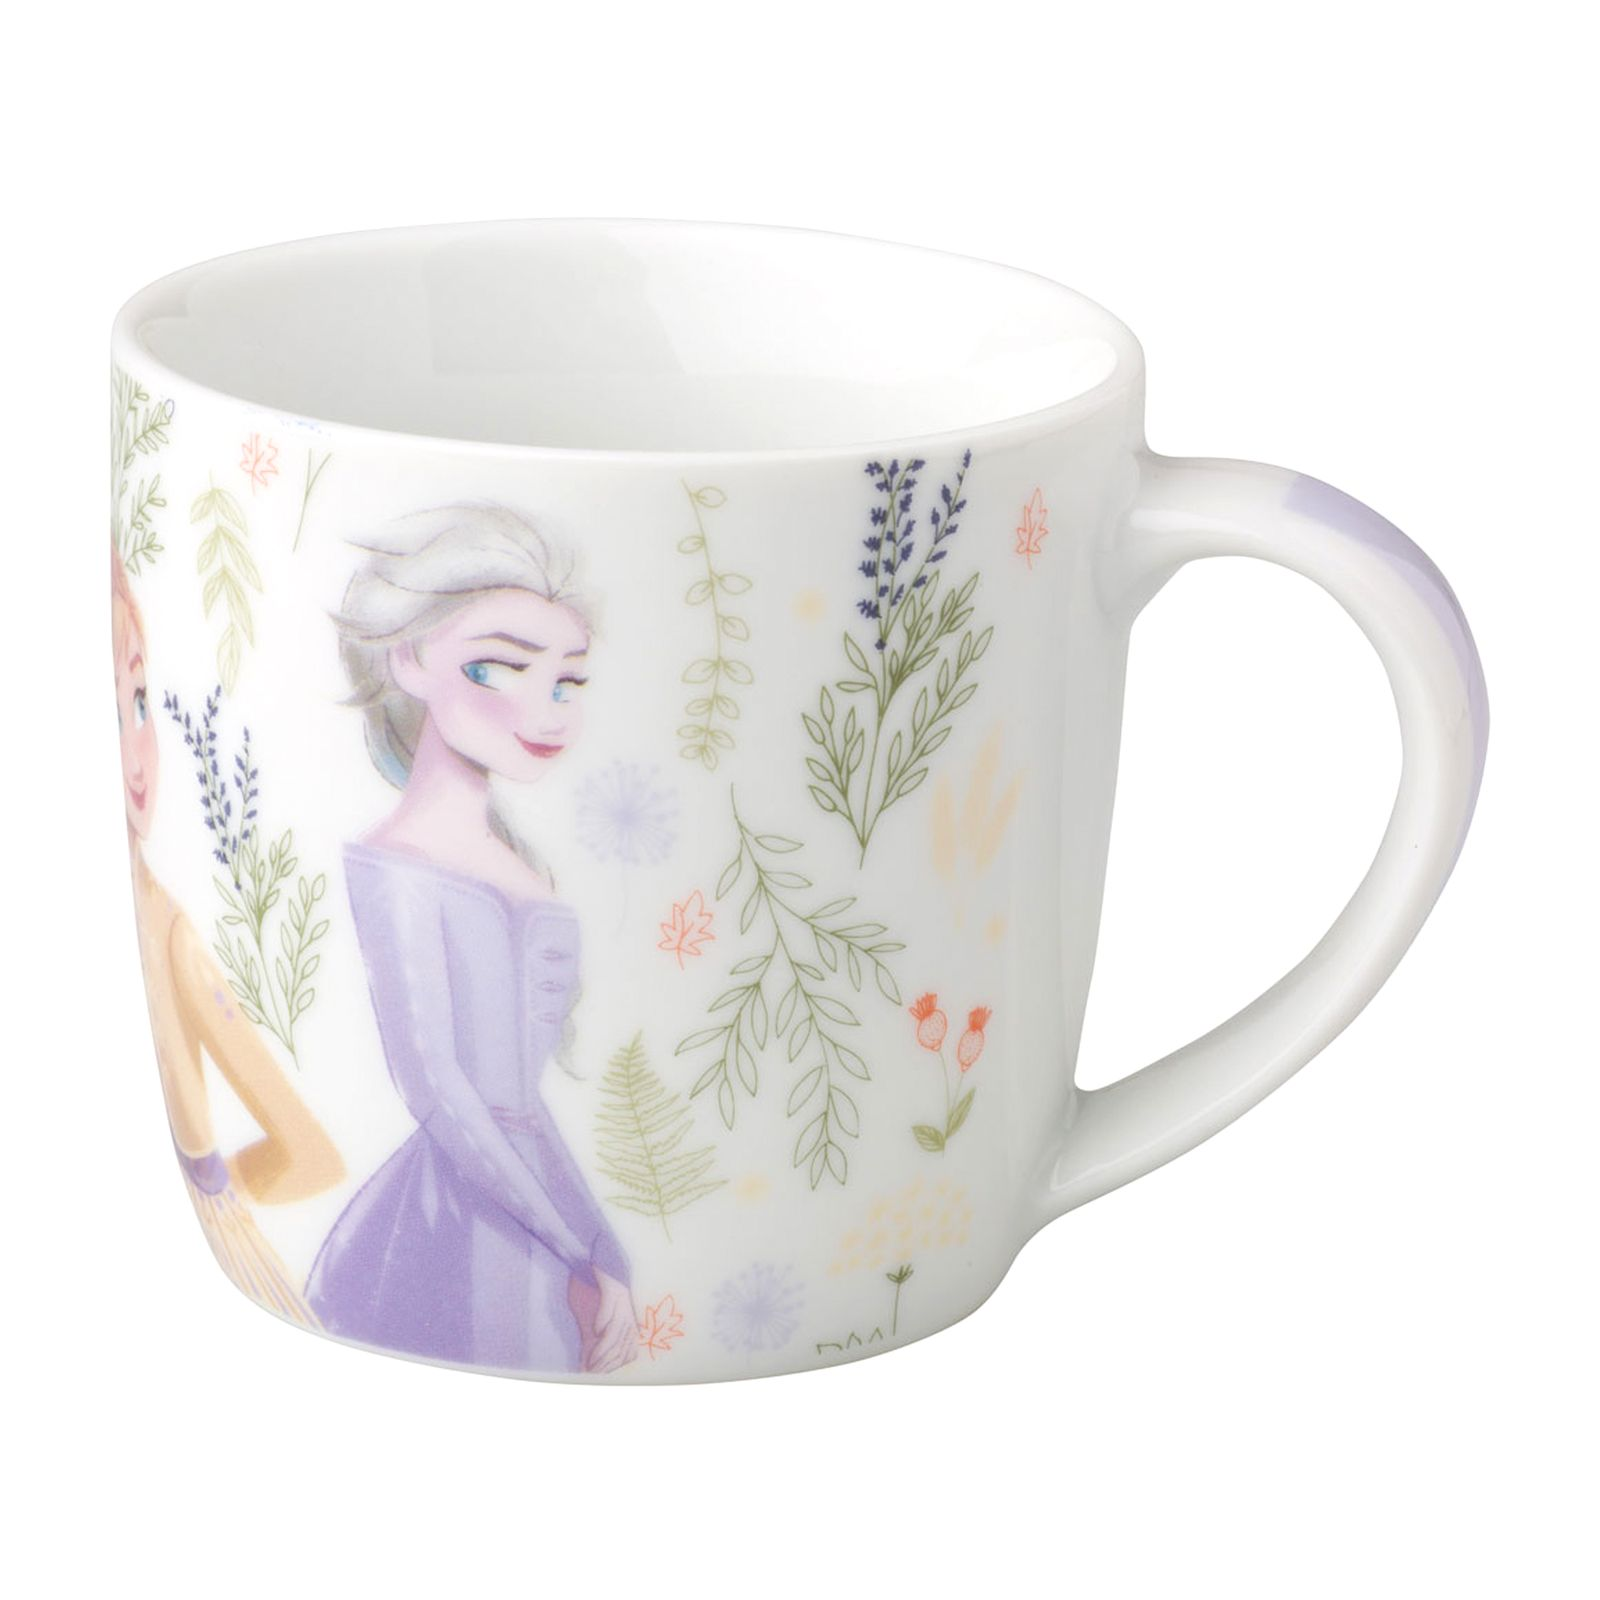 Porcelain mug Frozen II Herbal 300 ml DISNEY